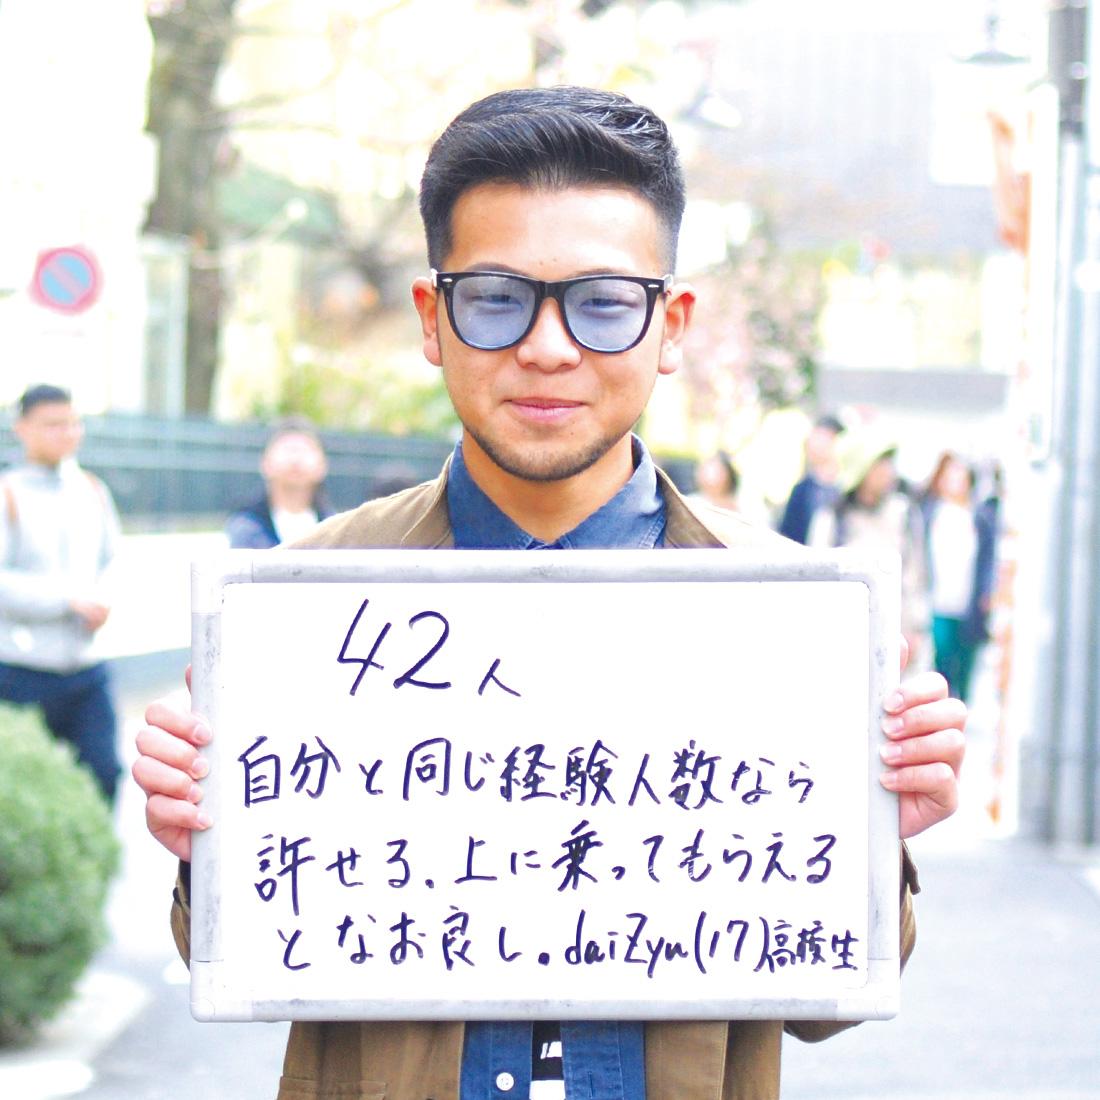 TOKYO GRAFFITICAMPUS GRAFFITIWORKS会社概要採用情報お問い合わせプライバシーポリシー日常のリアル 時代のアルバムストリートのきらめきを、メディアへ